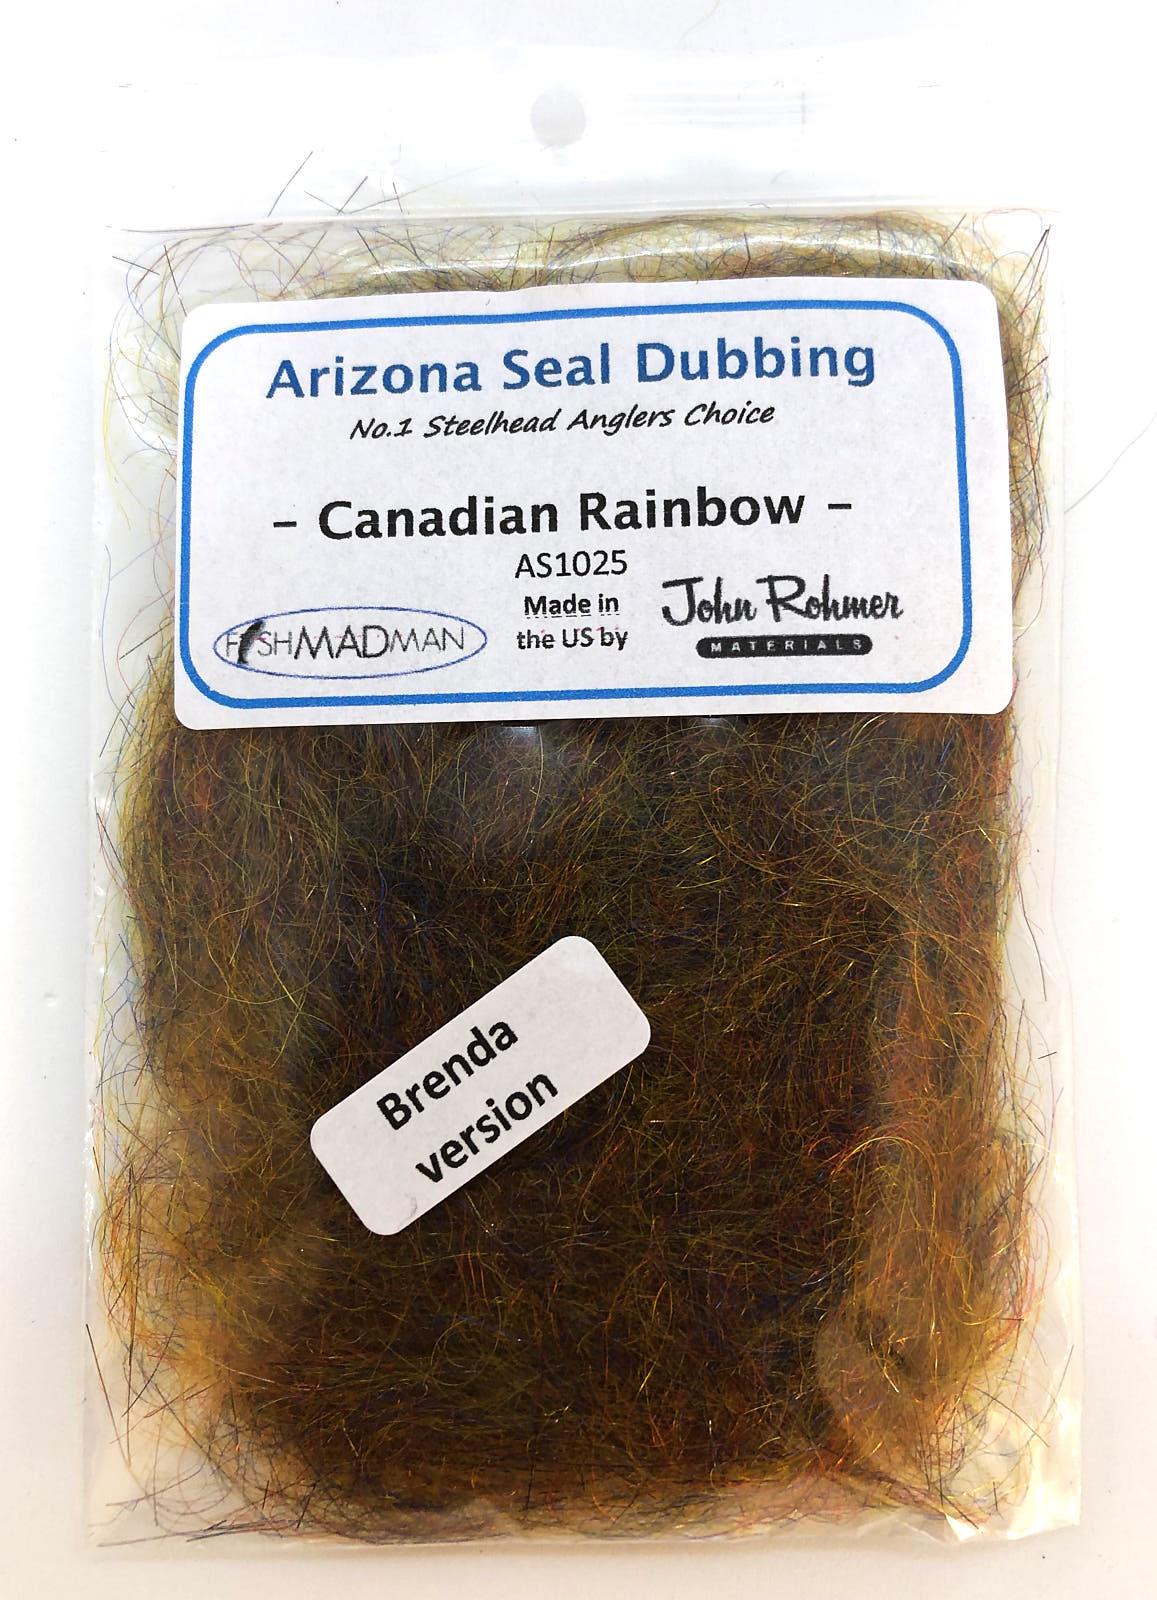 Arizona Simi Seal Dubbing Canadian Rainbow AS1025